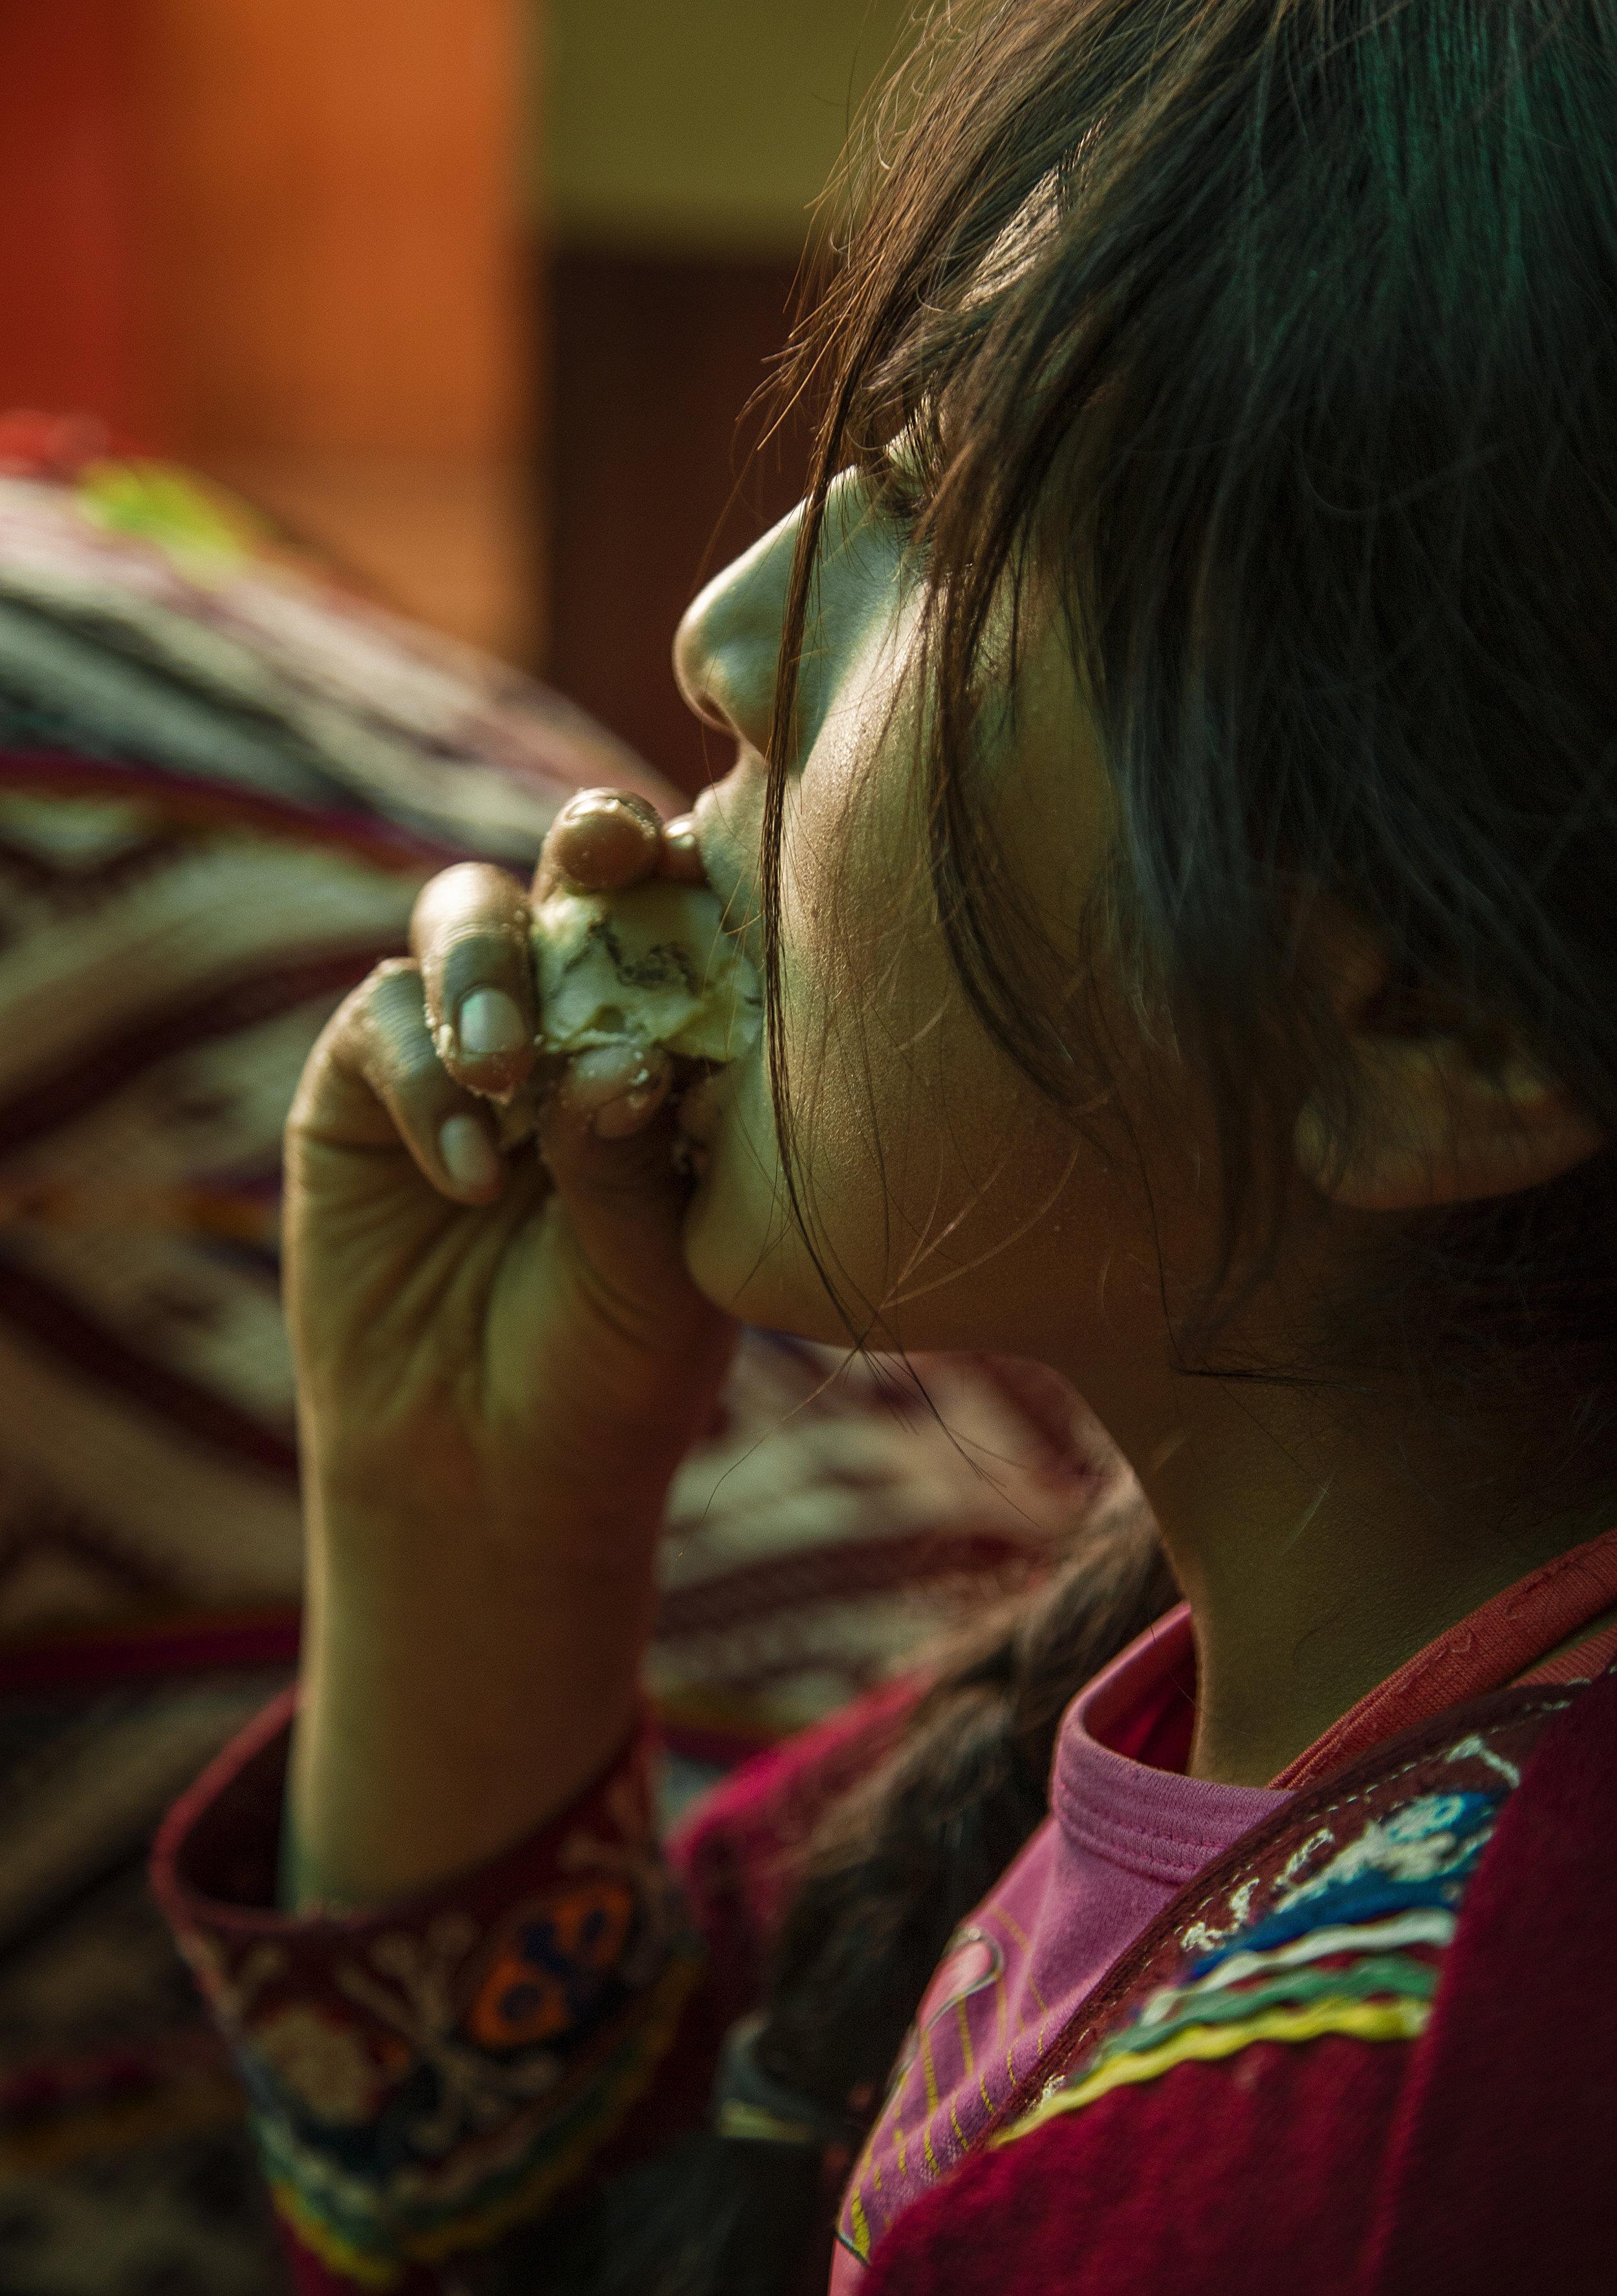 Simon+Needham+Humanitarian+Photography+Peru+21.jpg